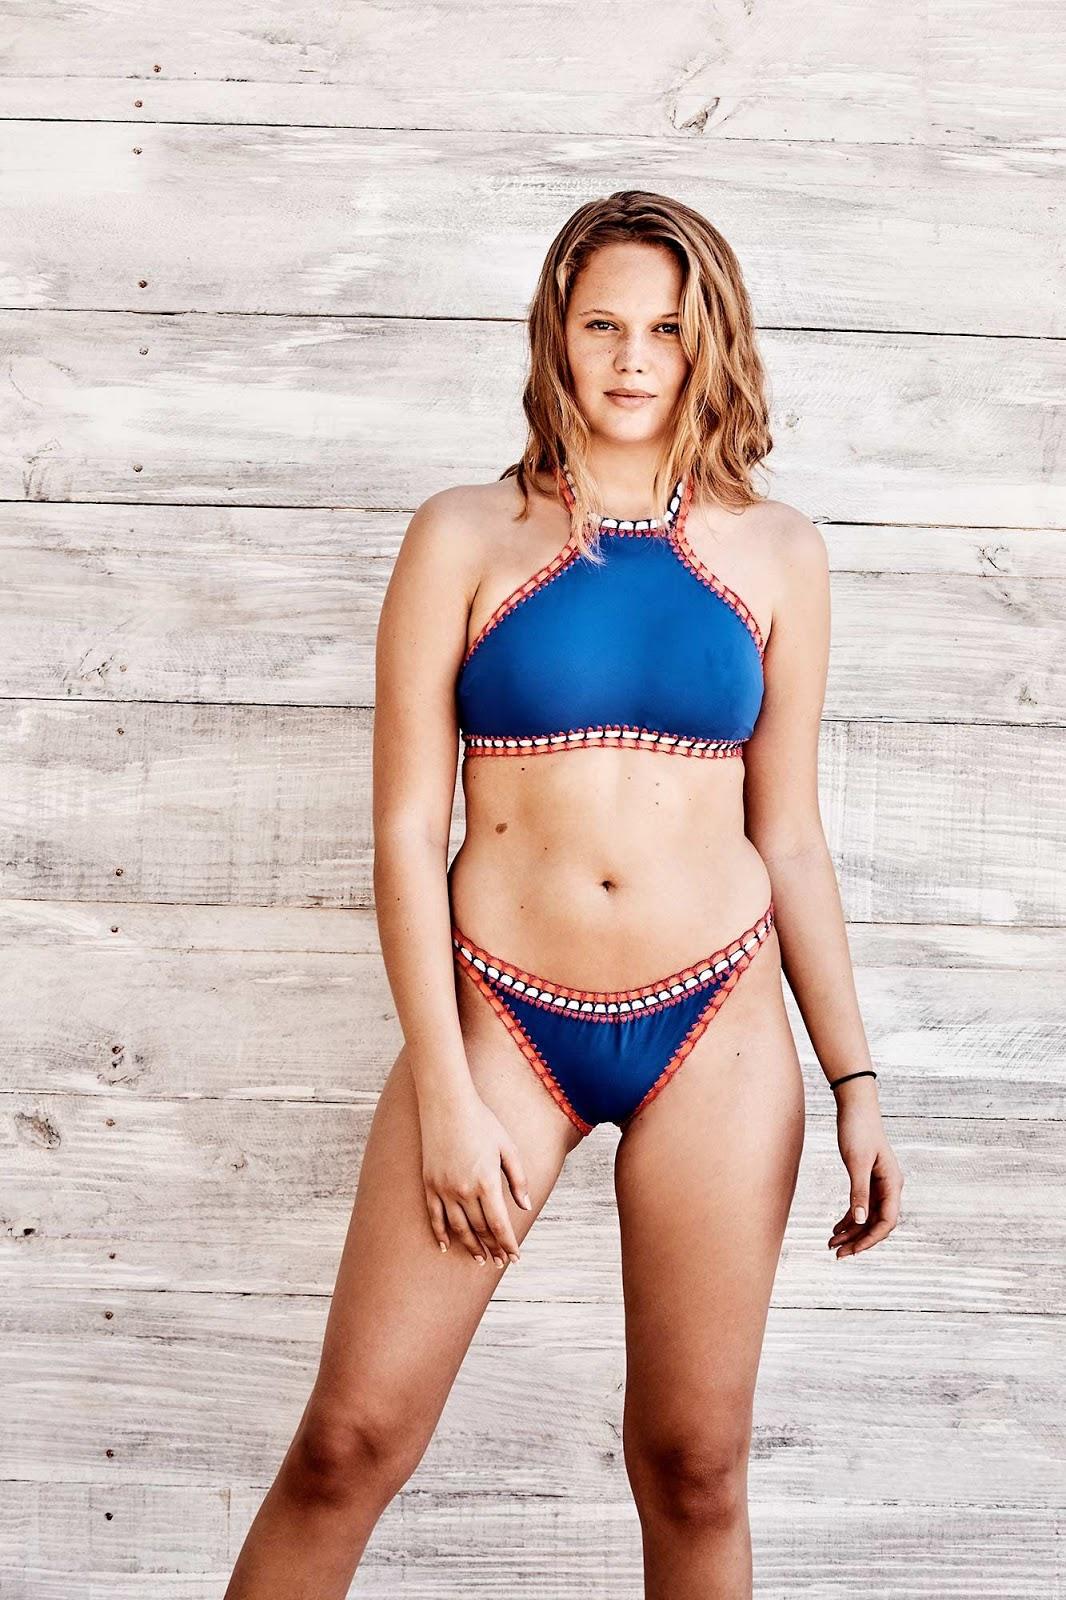 Bikini Natalia Andreeva naked (64 photo), Topless, Leaked, Selfie, cleavage 2019